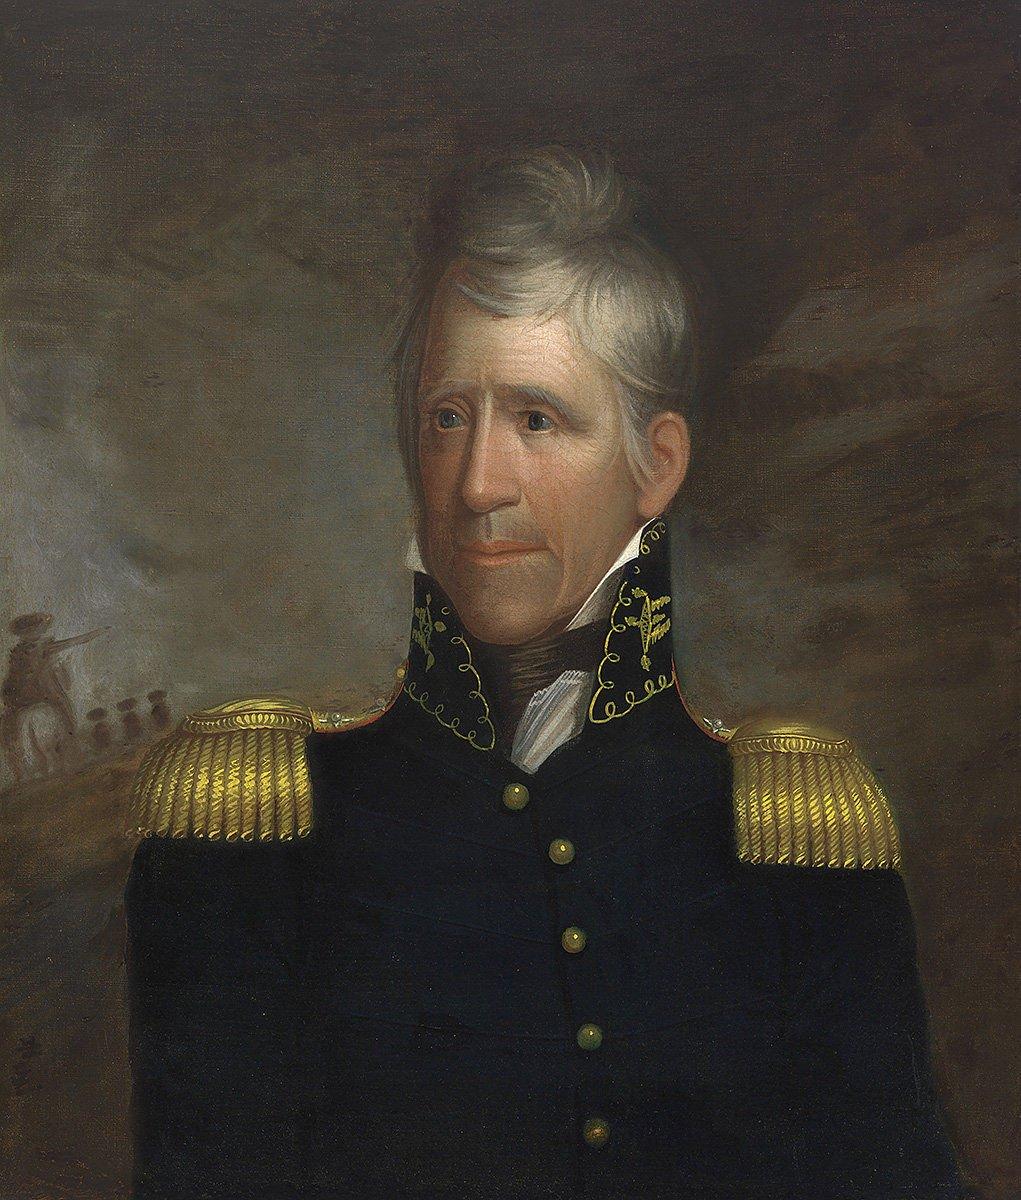 Battle of New Orleans bicentennial exhibit brings Andrew Jackson's jacket back